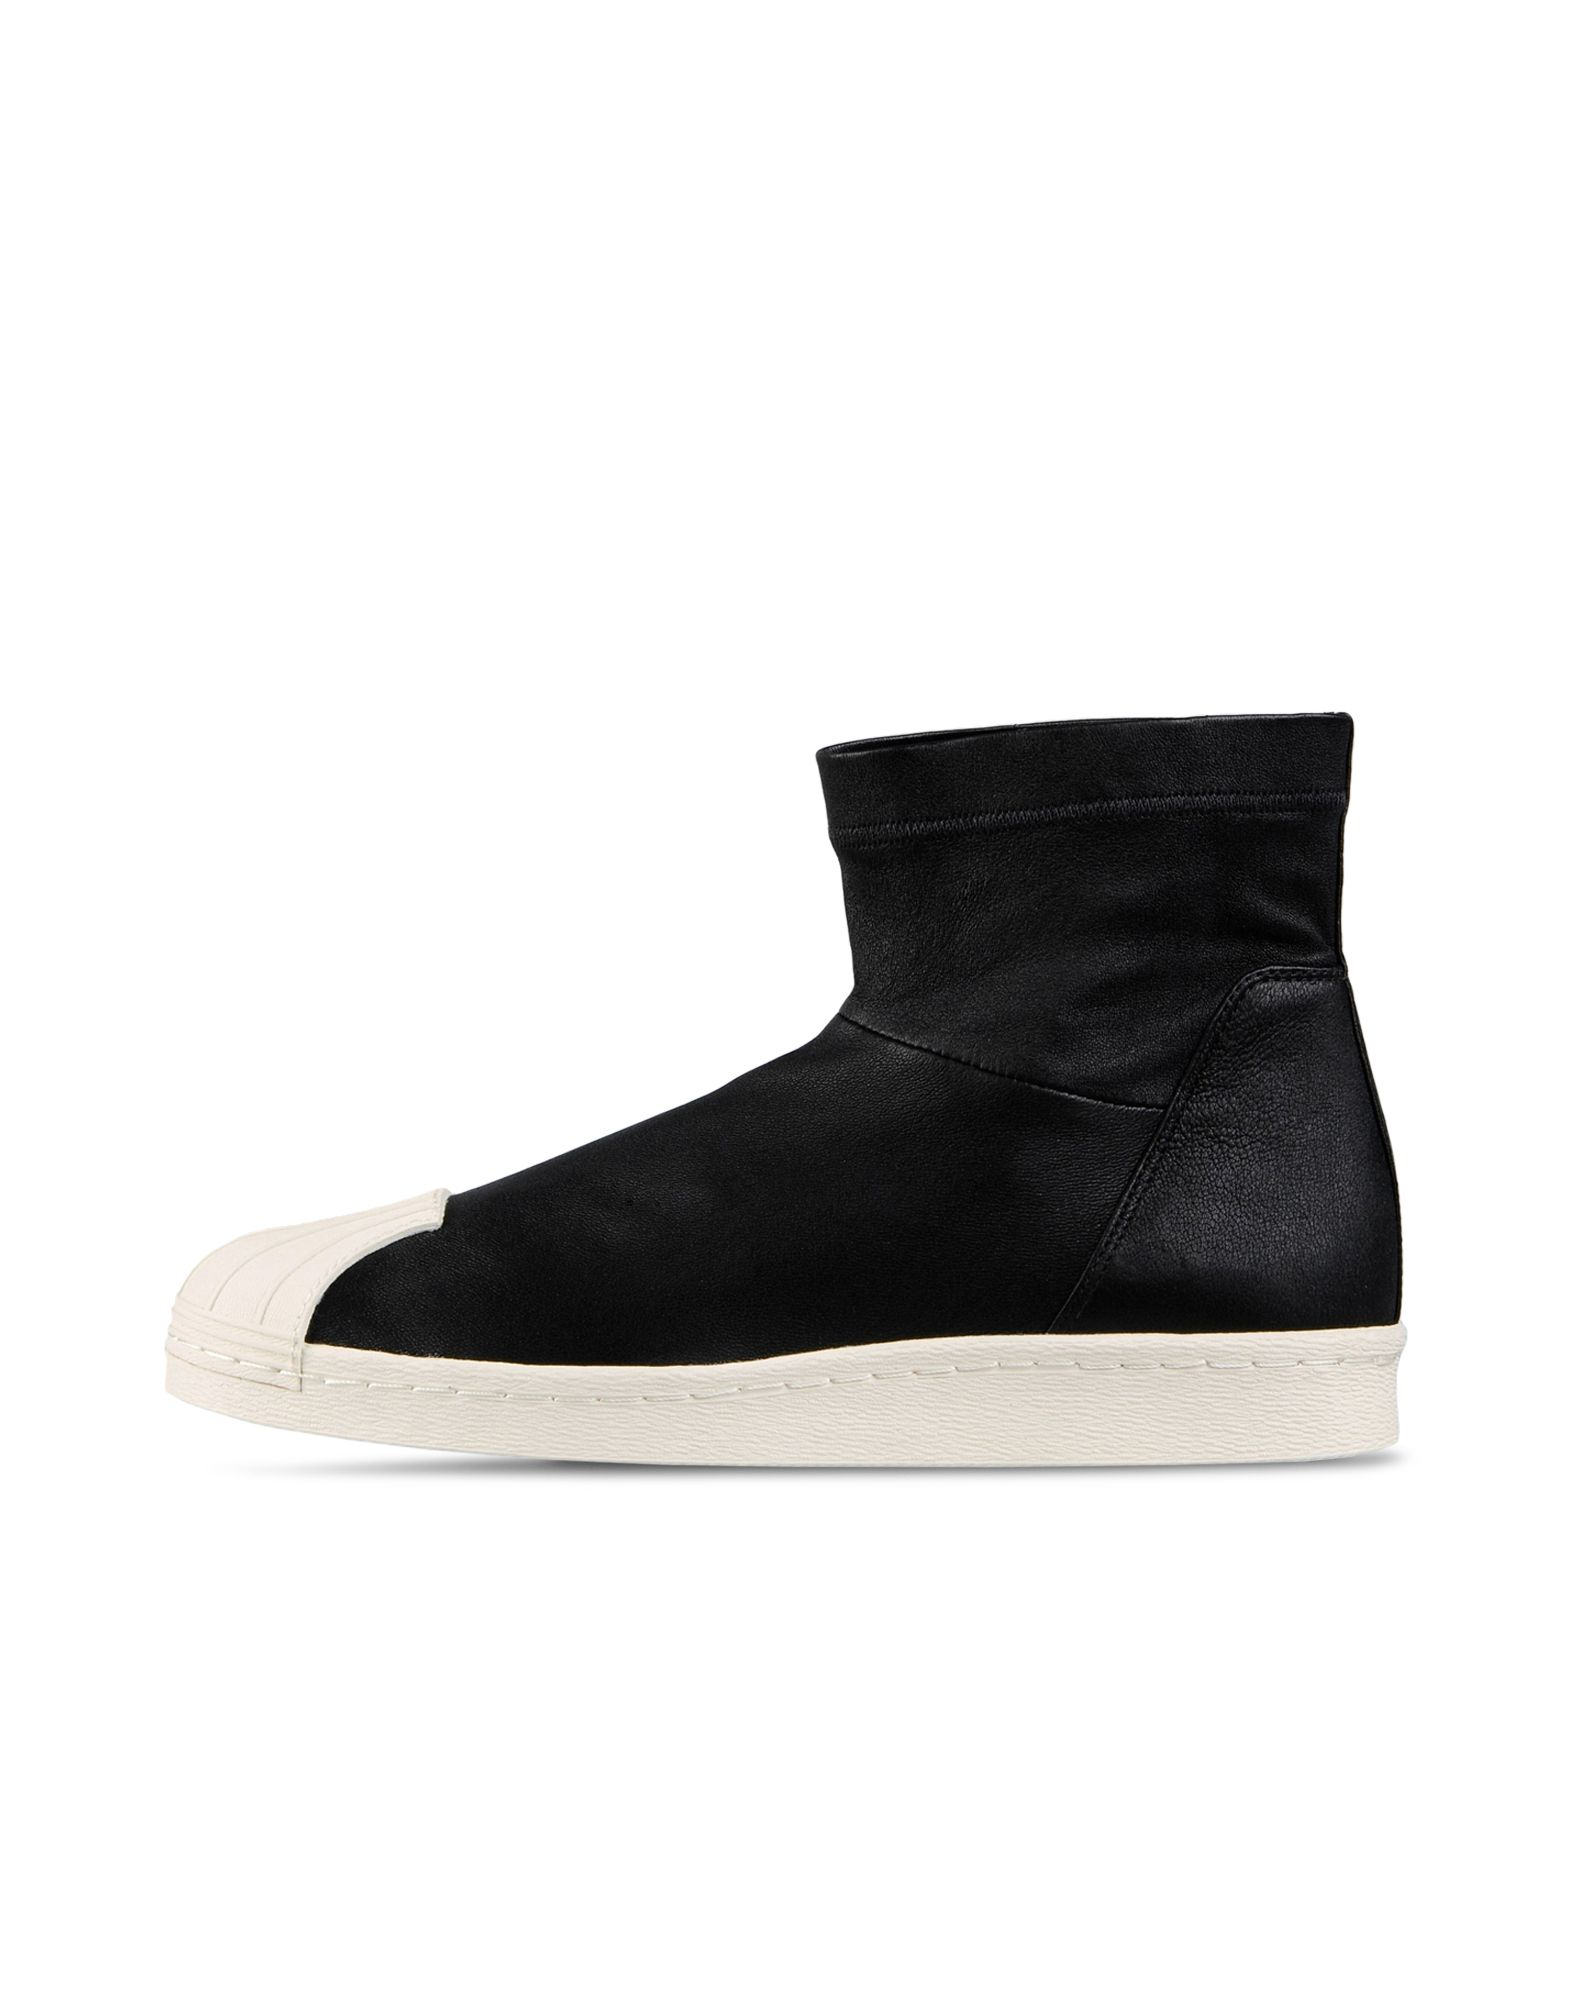 Superstar Adidas Half Boots